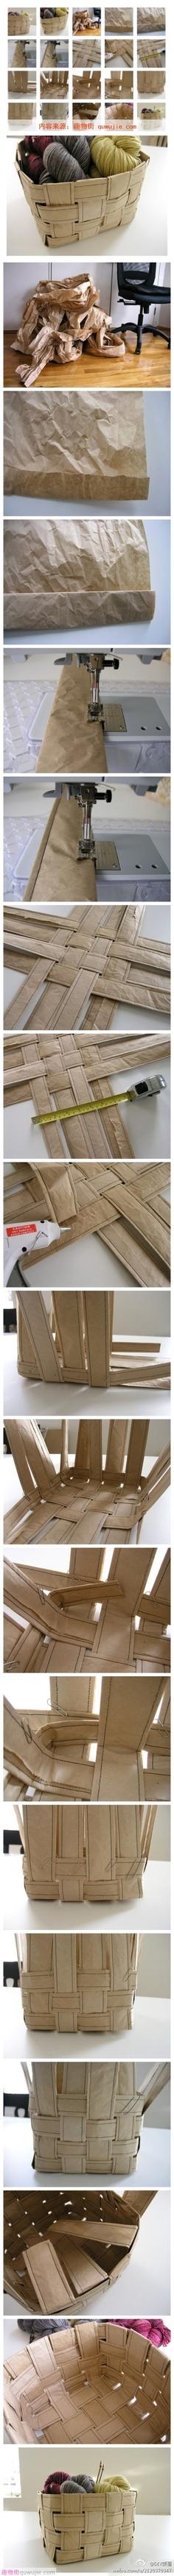 Paper: Craft Paper Basket DIY 废物 旧物 利用 储物框